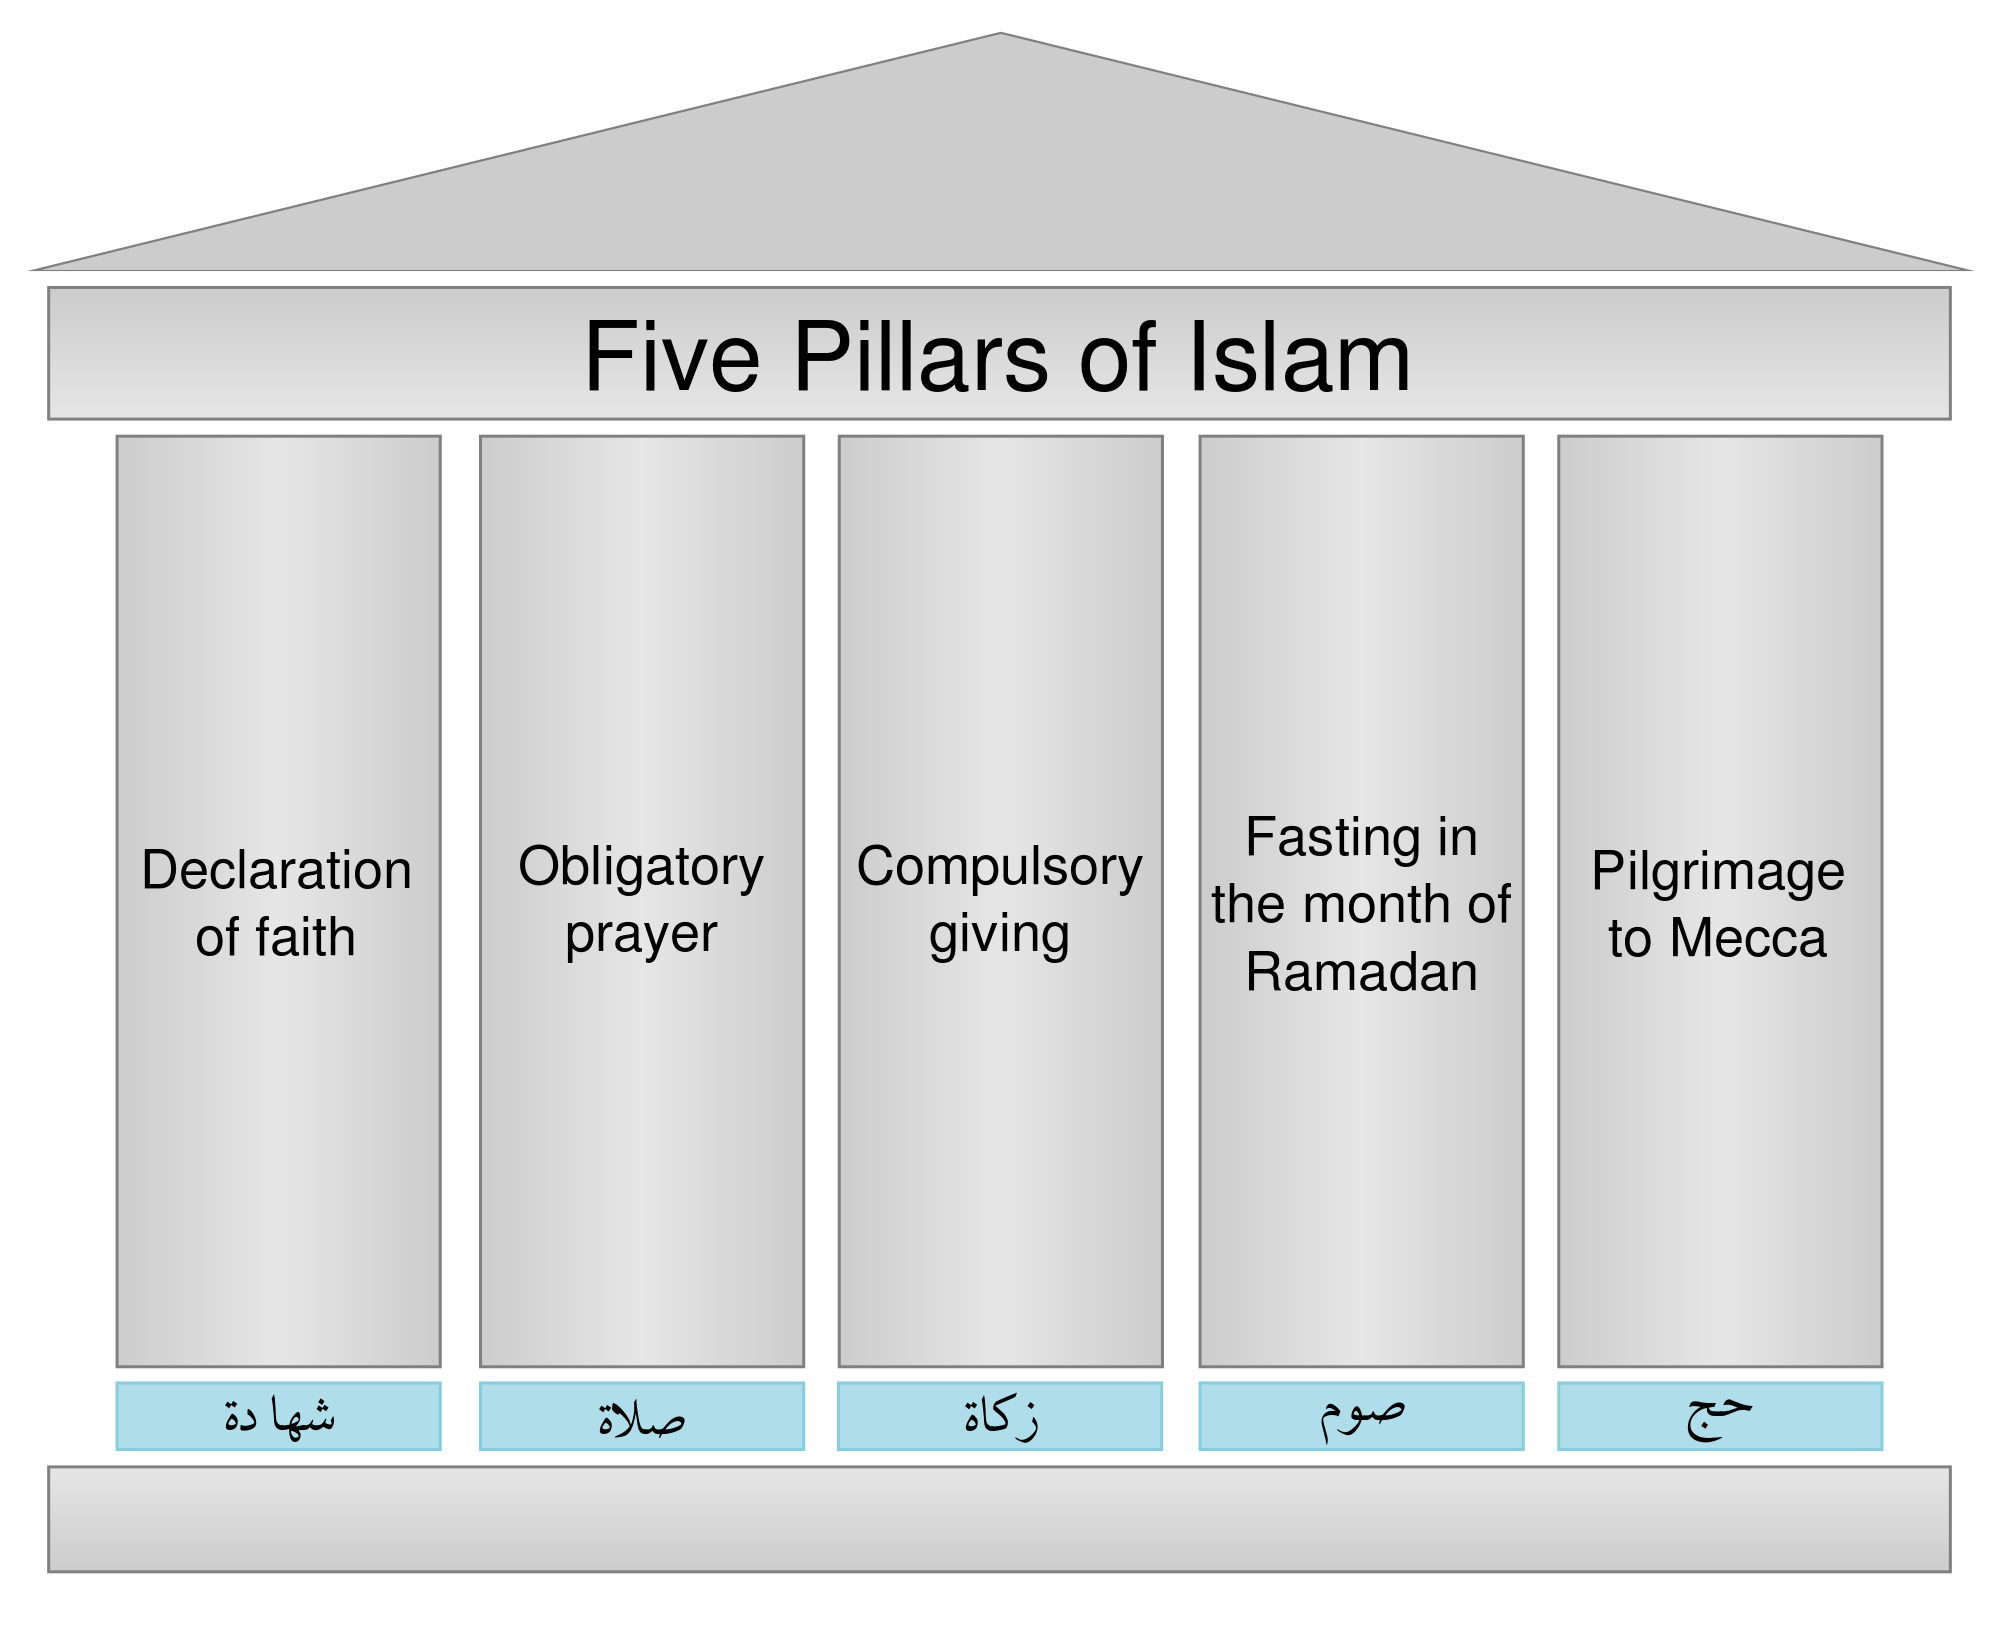 Uncategorized Five Pillars Of Islam Worksheet the five pillars profession of faith shahada faith